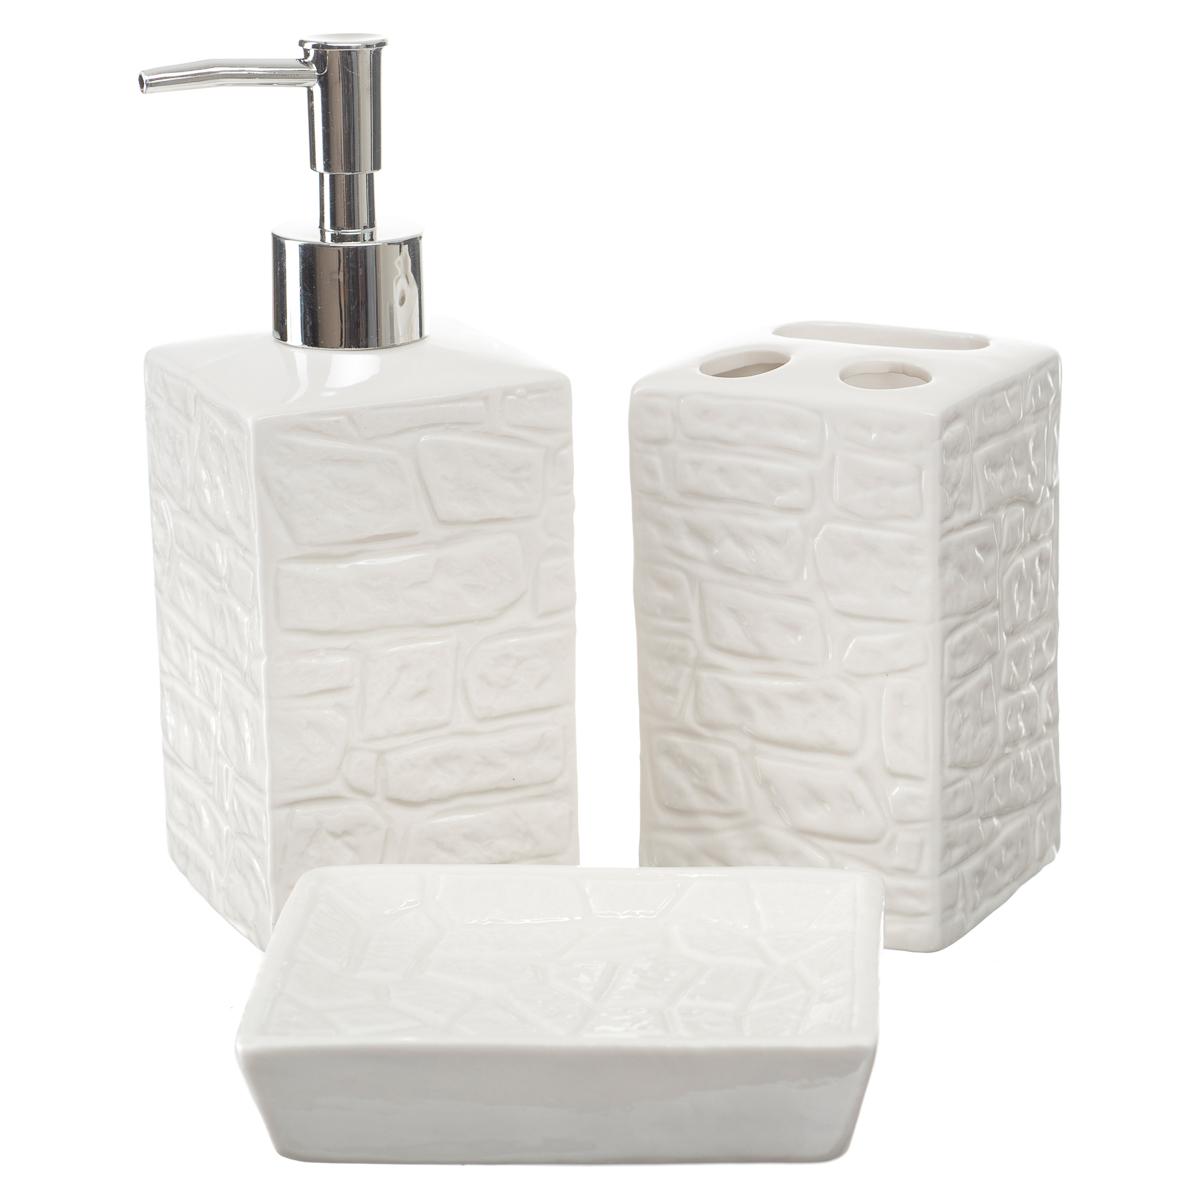 Kit Banheiro Conjunto Lavabo Porta Sabonete Líquido Br332